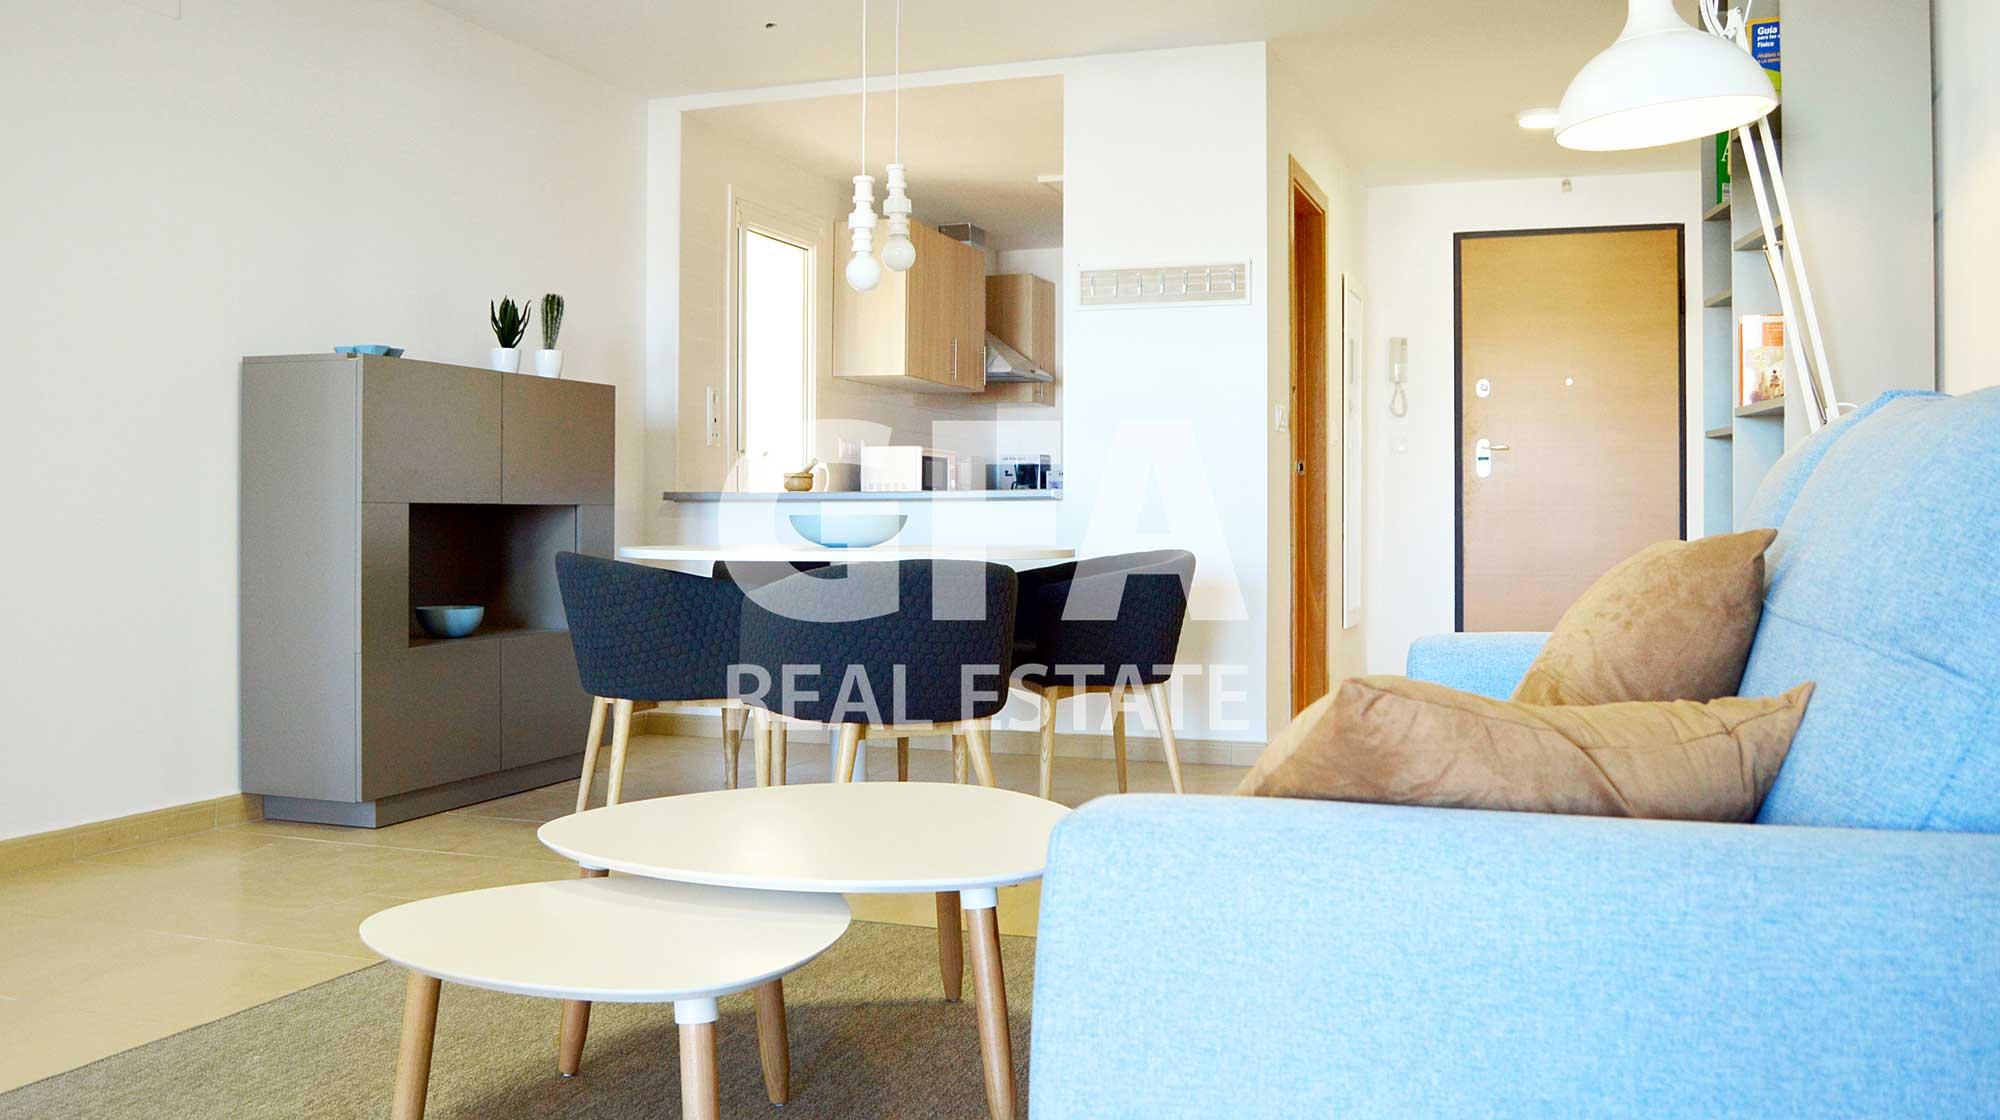 boulevard-viviendas-de-obra-nueva-resort-mar-menor (11)